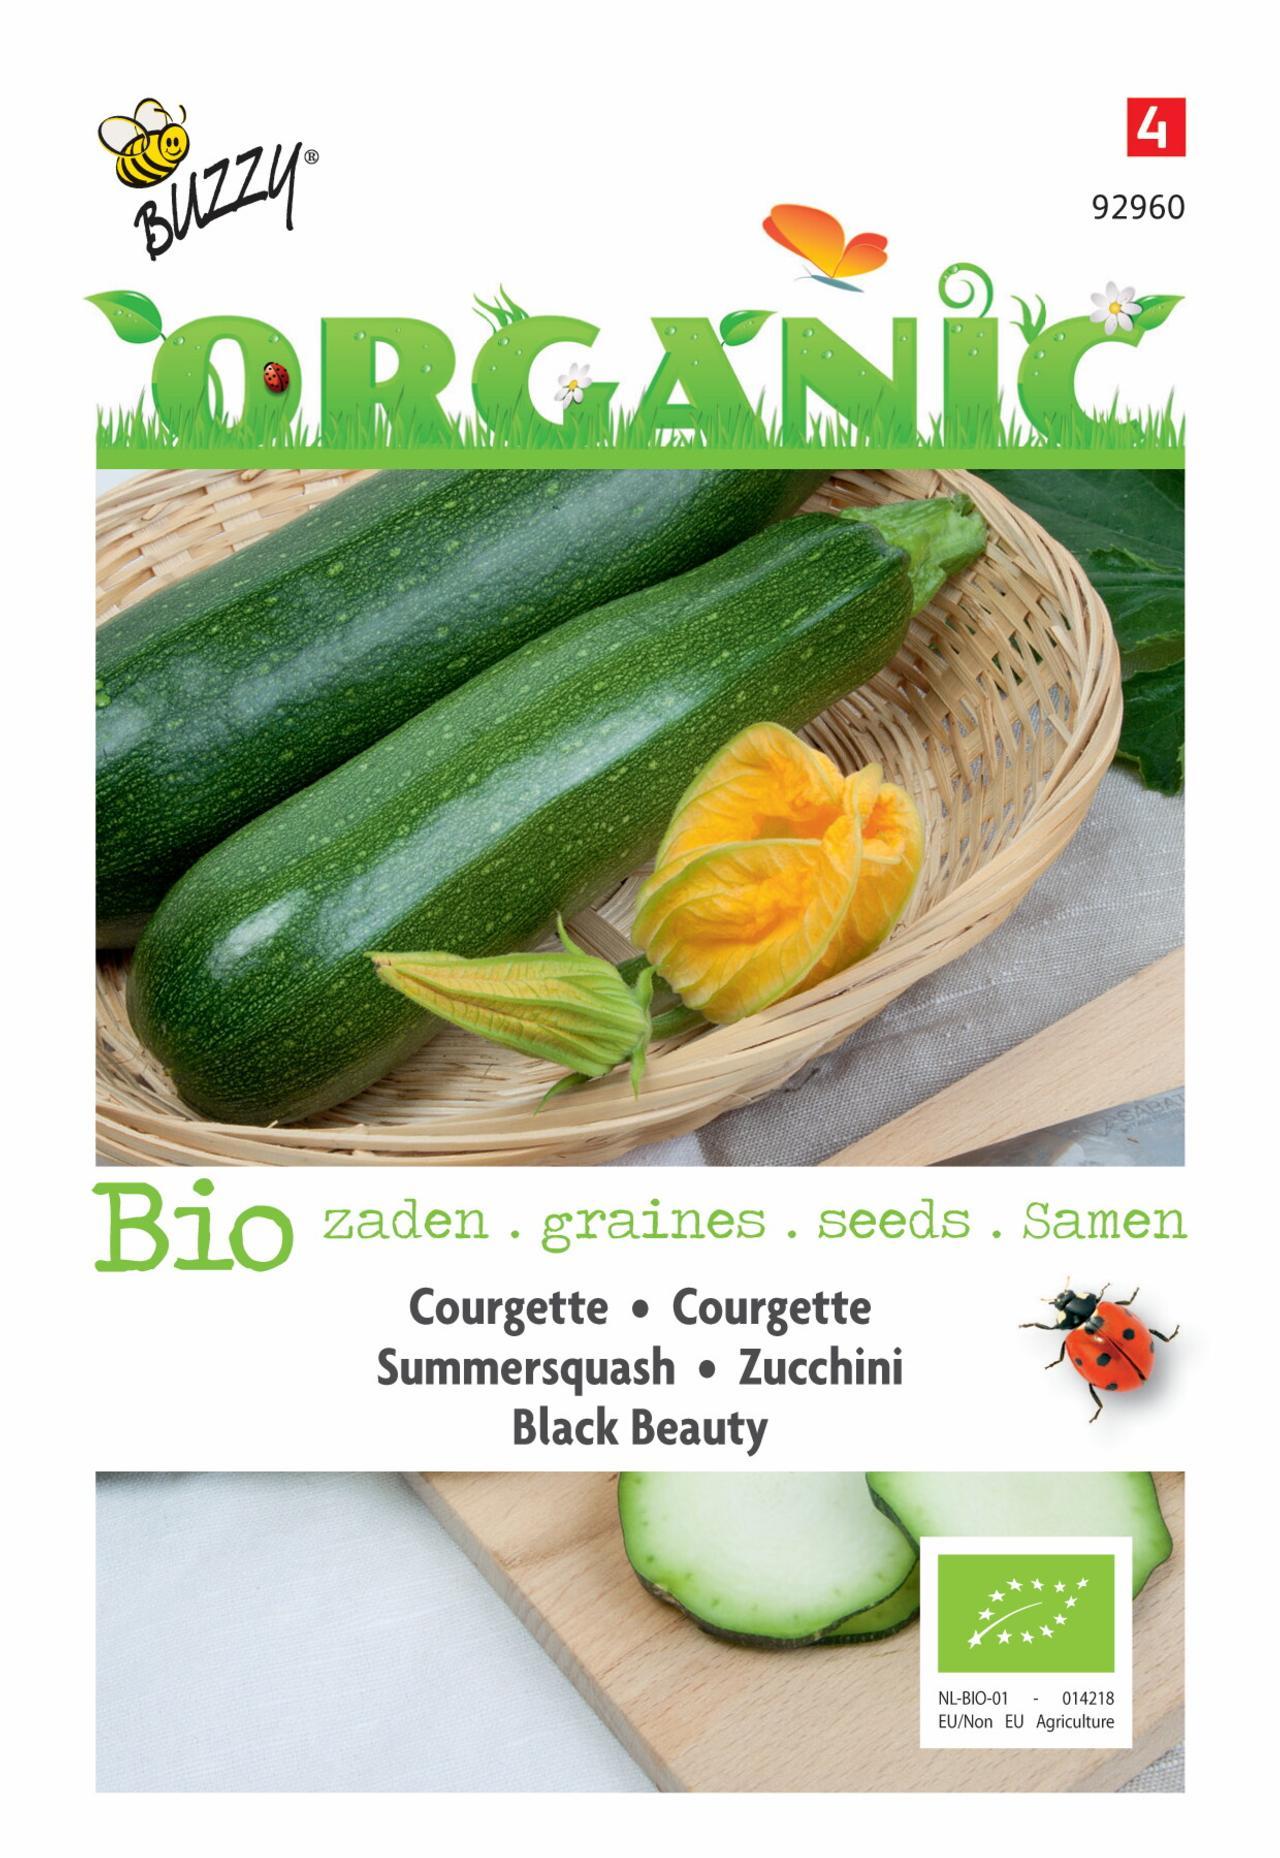 Cucurbita pepo 'Black Beauty' (BIO) plant